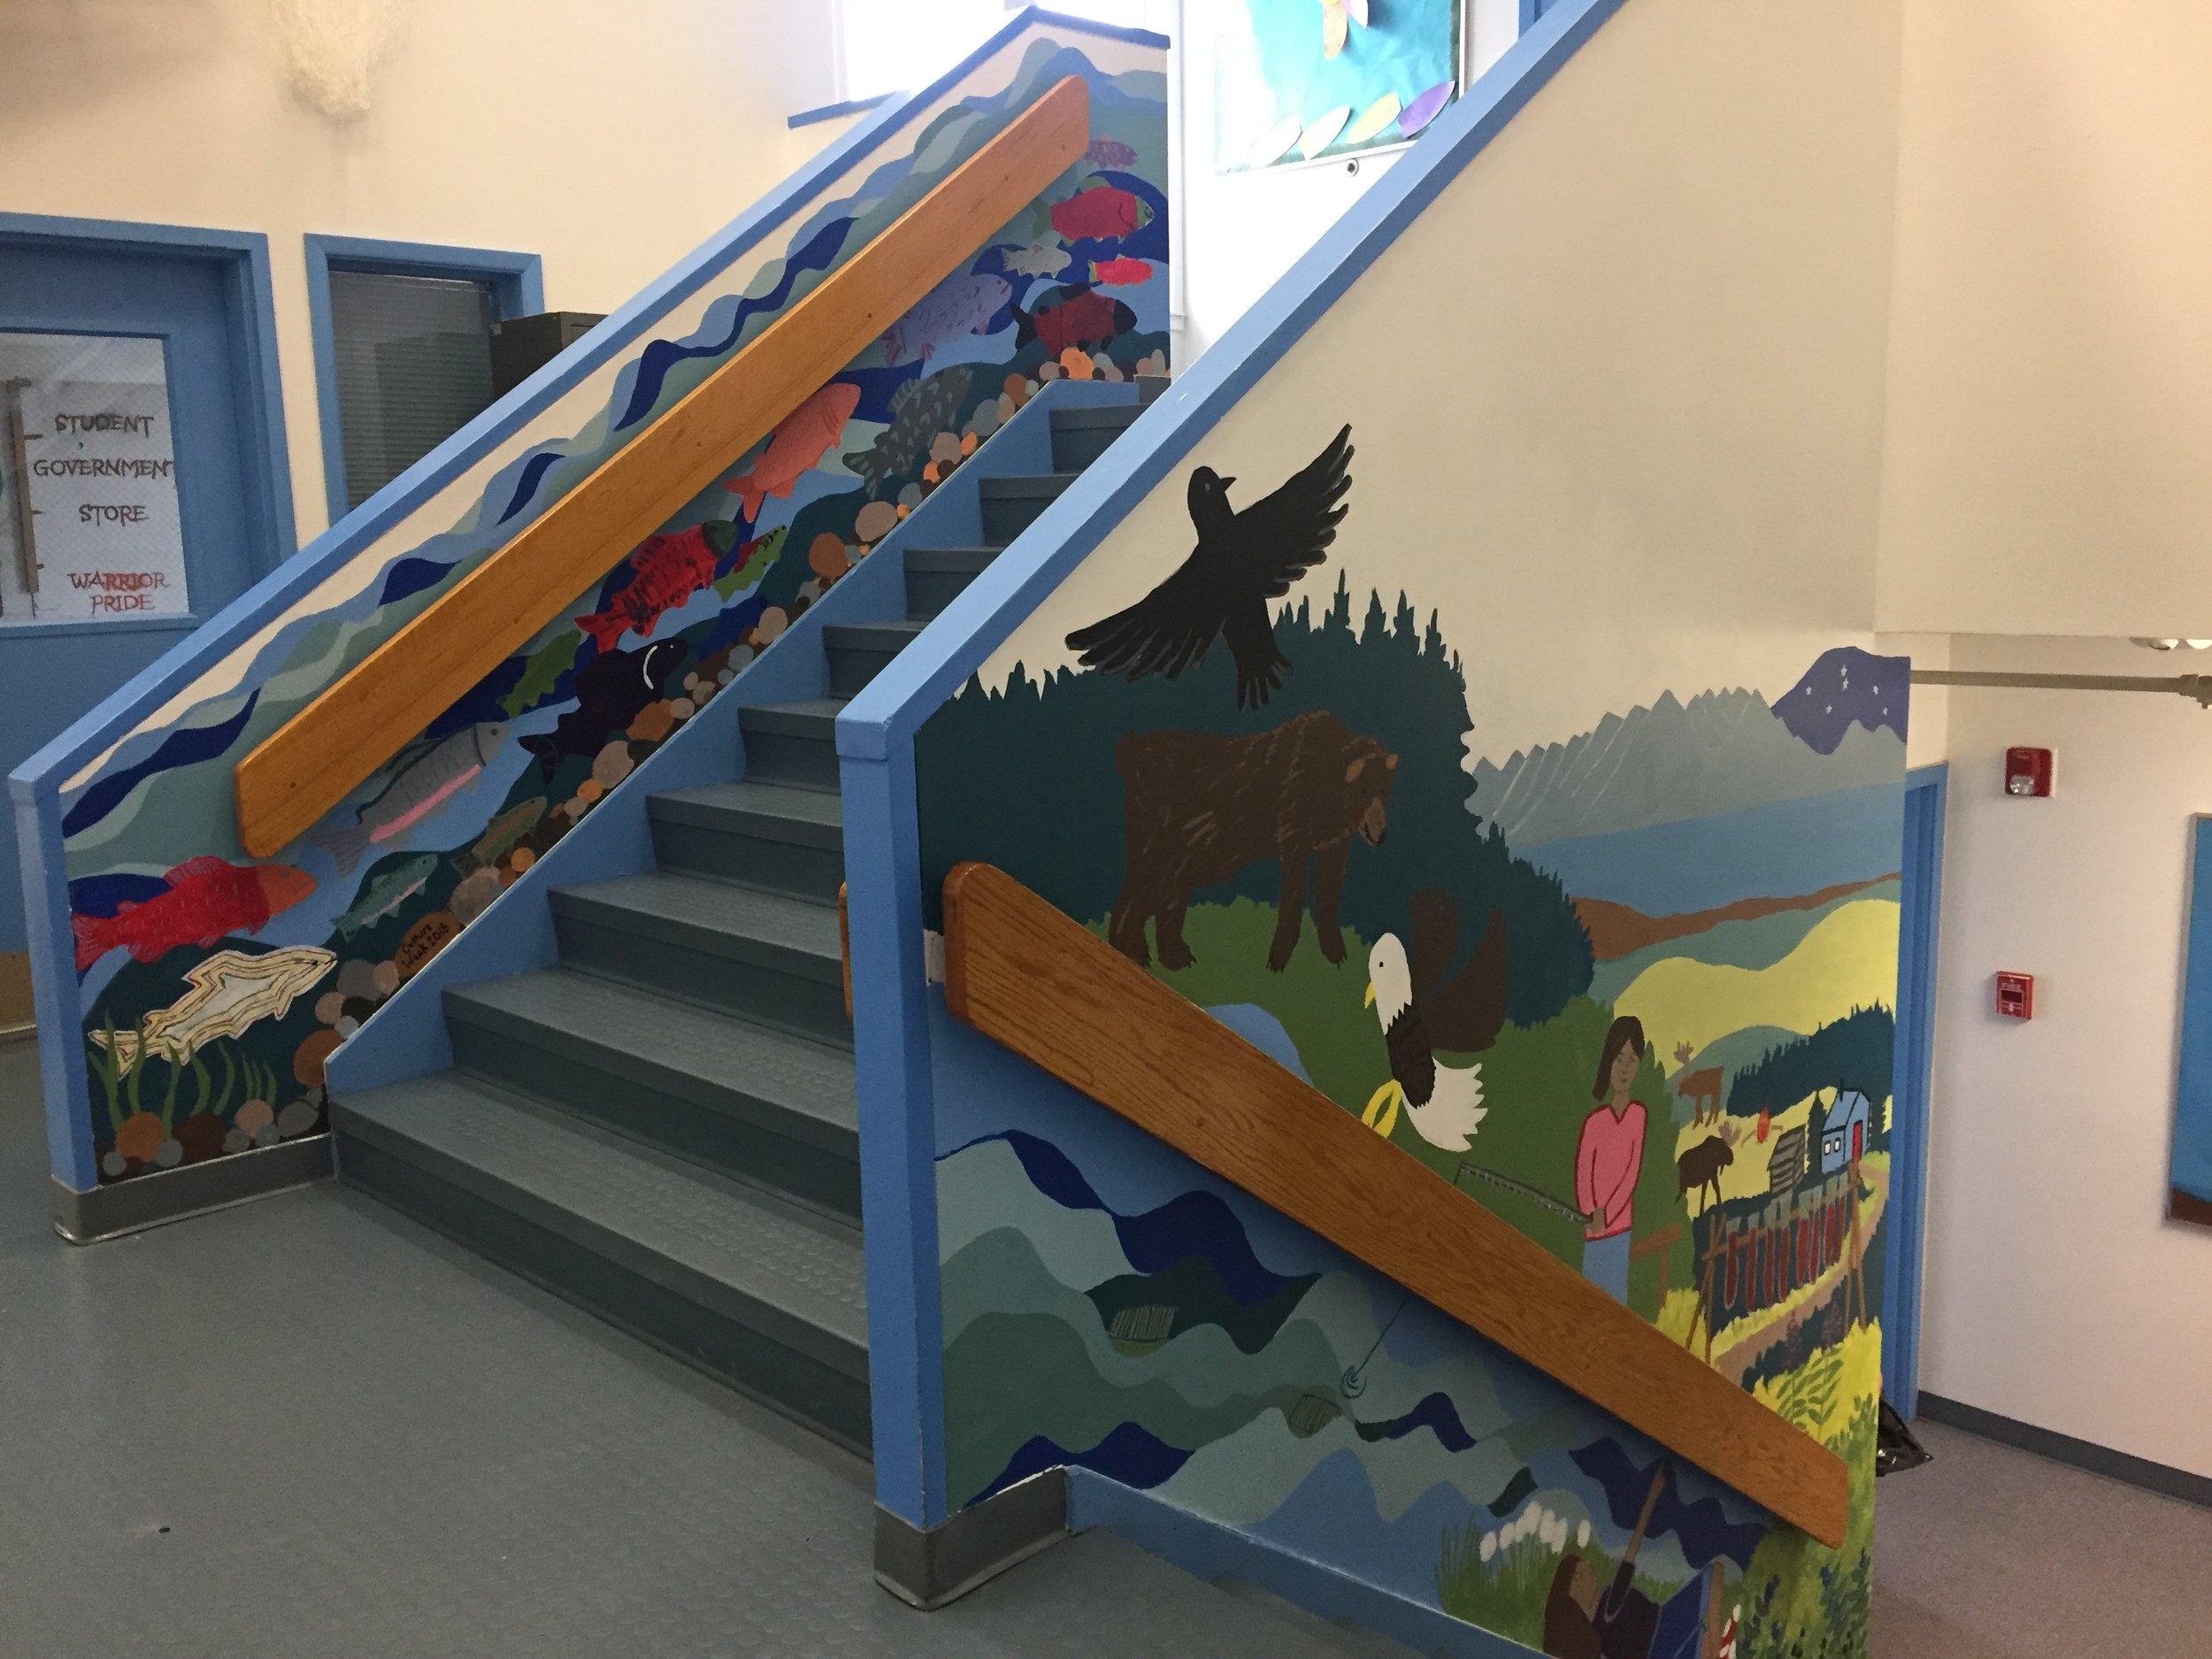 Part of the Nondalton School mural